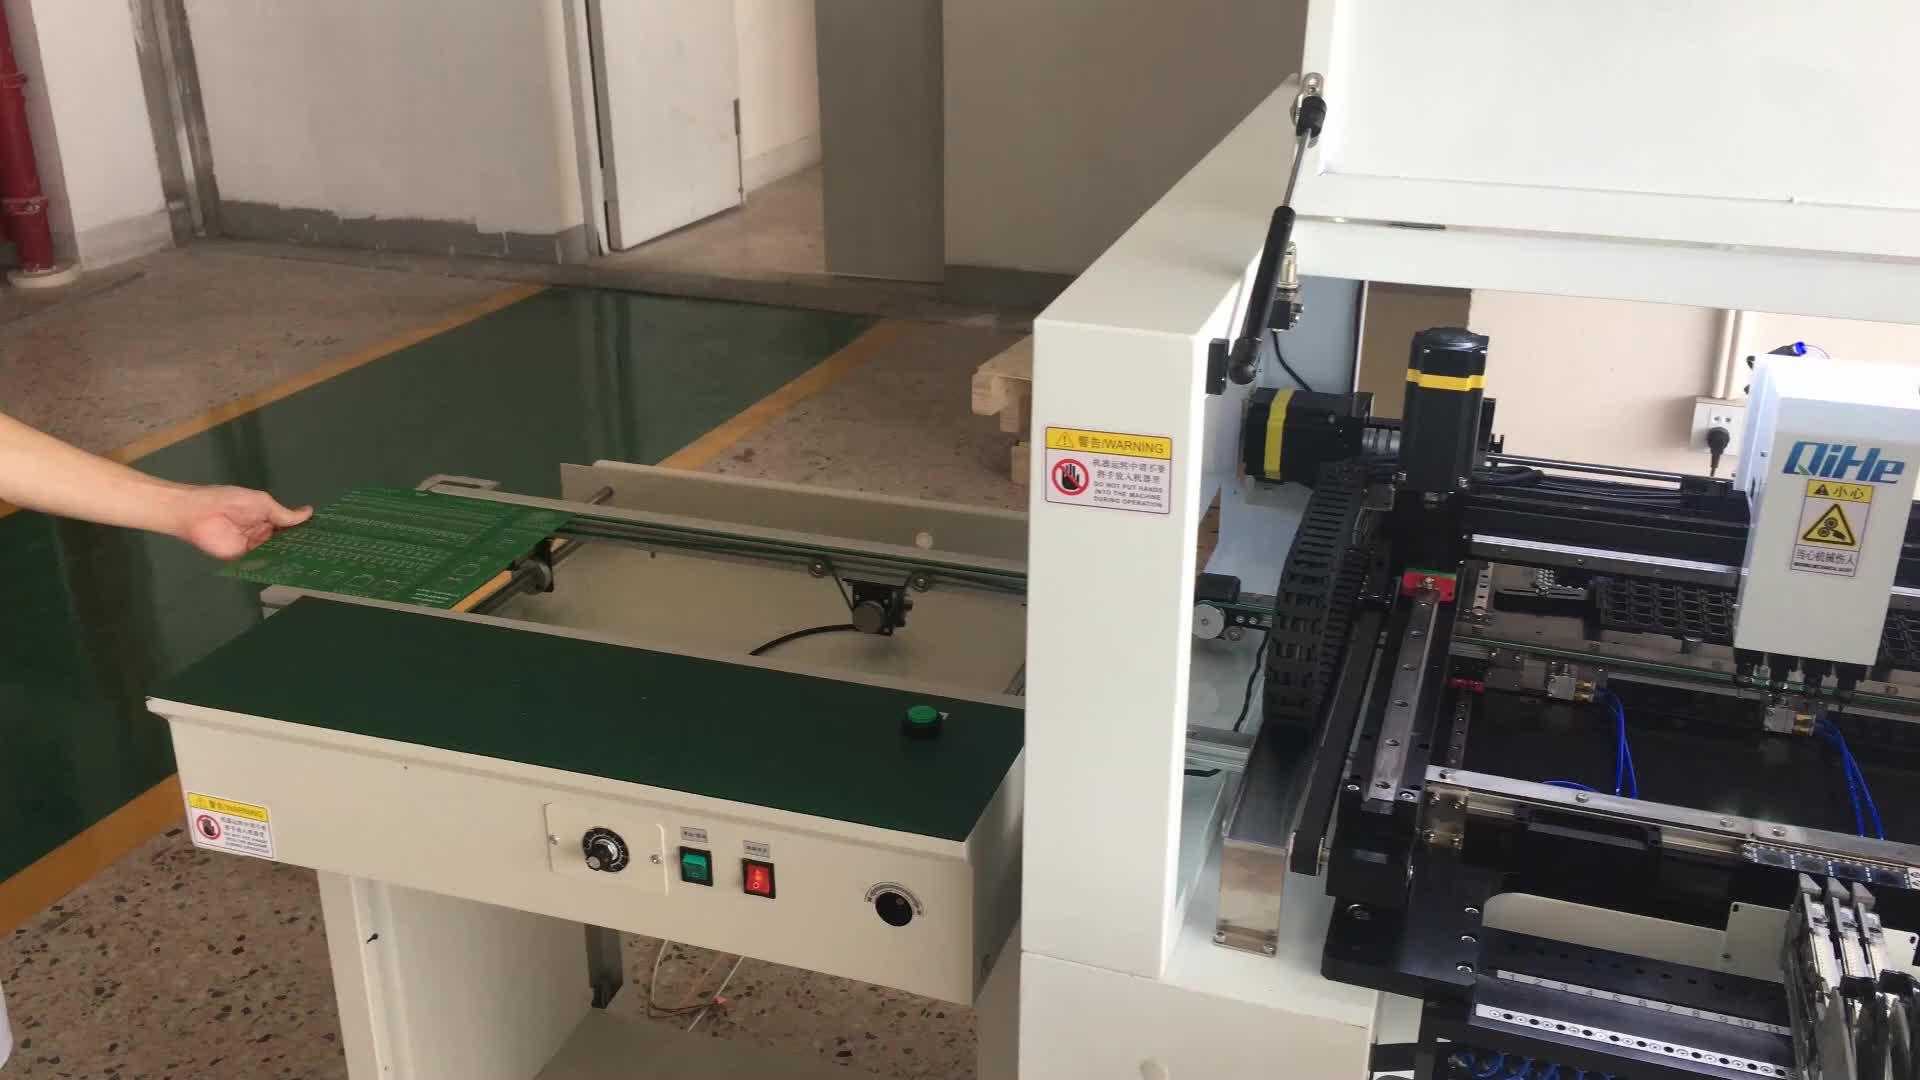 Qihe 전체 자동 칩 마운터 전구 만드는 기계 조립 라인